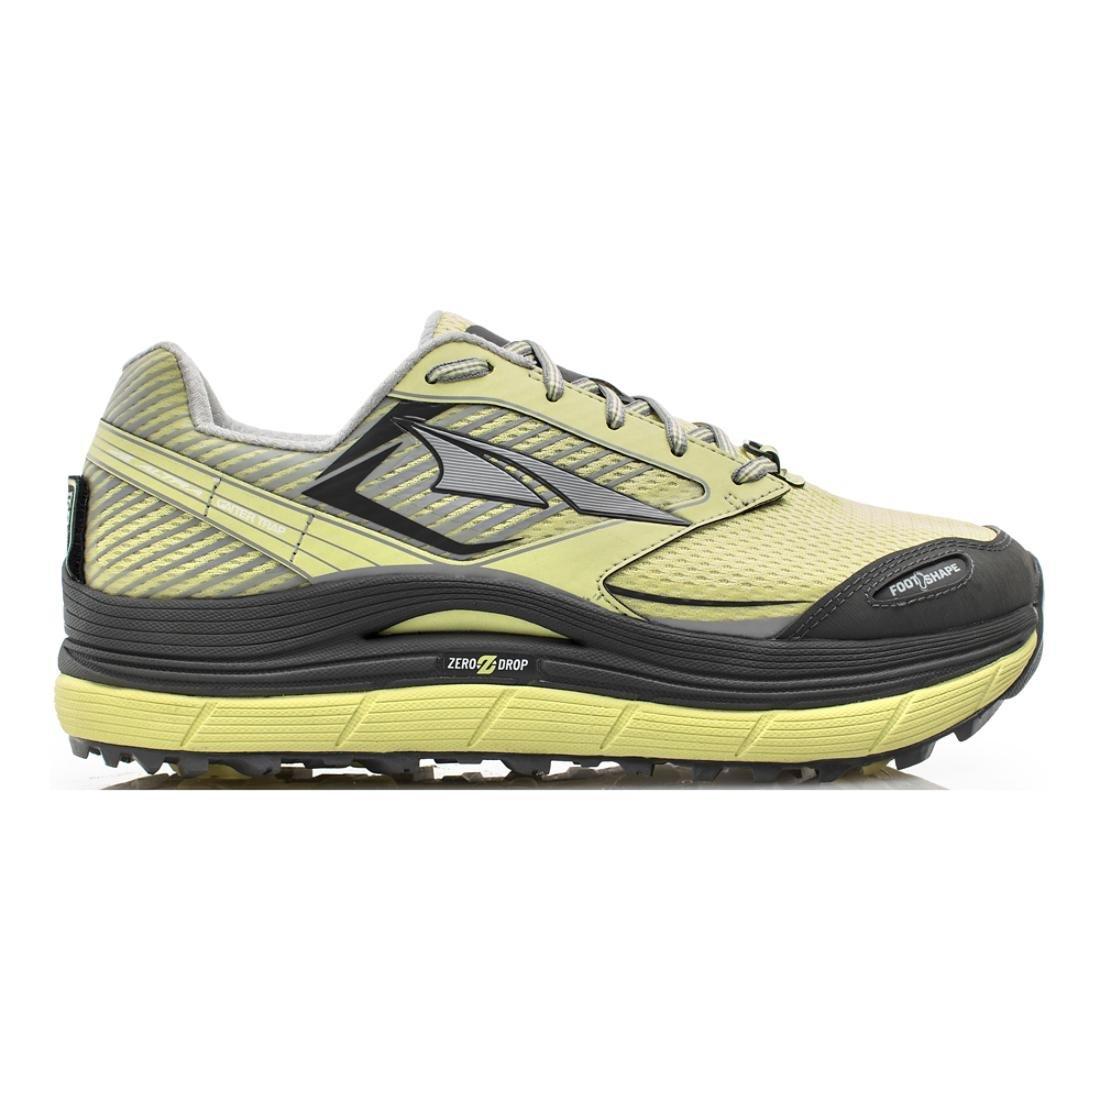 Altra Women's Olympus 2.5 Trail Running Shoe B01N6JCDC0 11 B(M) US|Lime